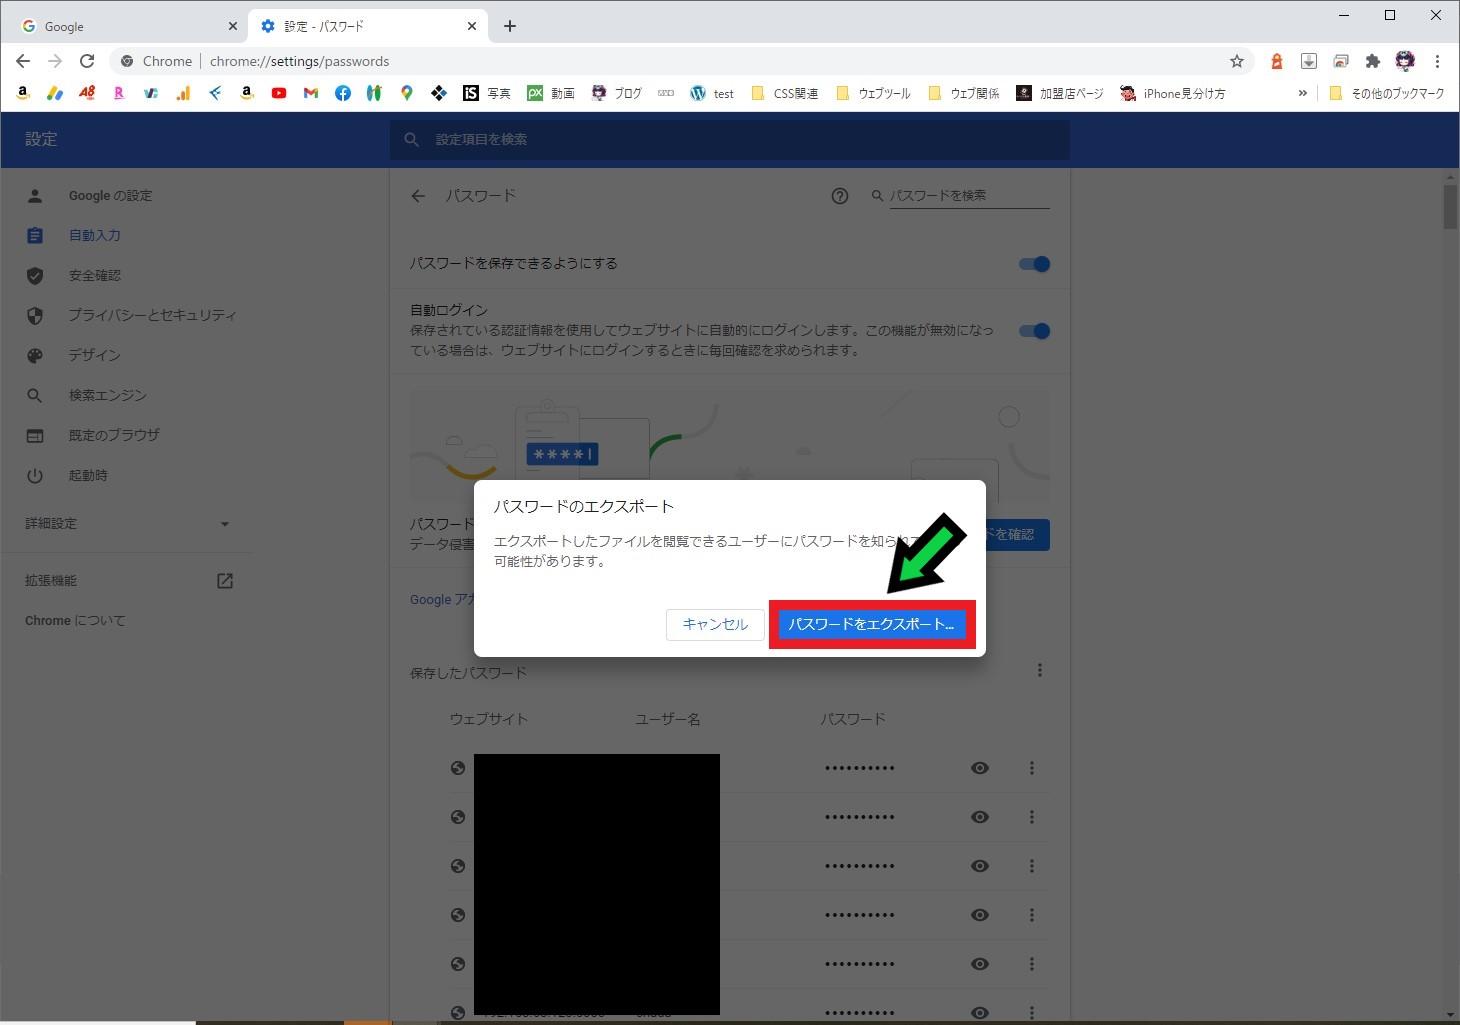 Google Chrome上のID、パスワード情報をエクスポートする方法【クロームのパスワード移行】